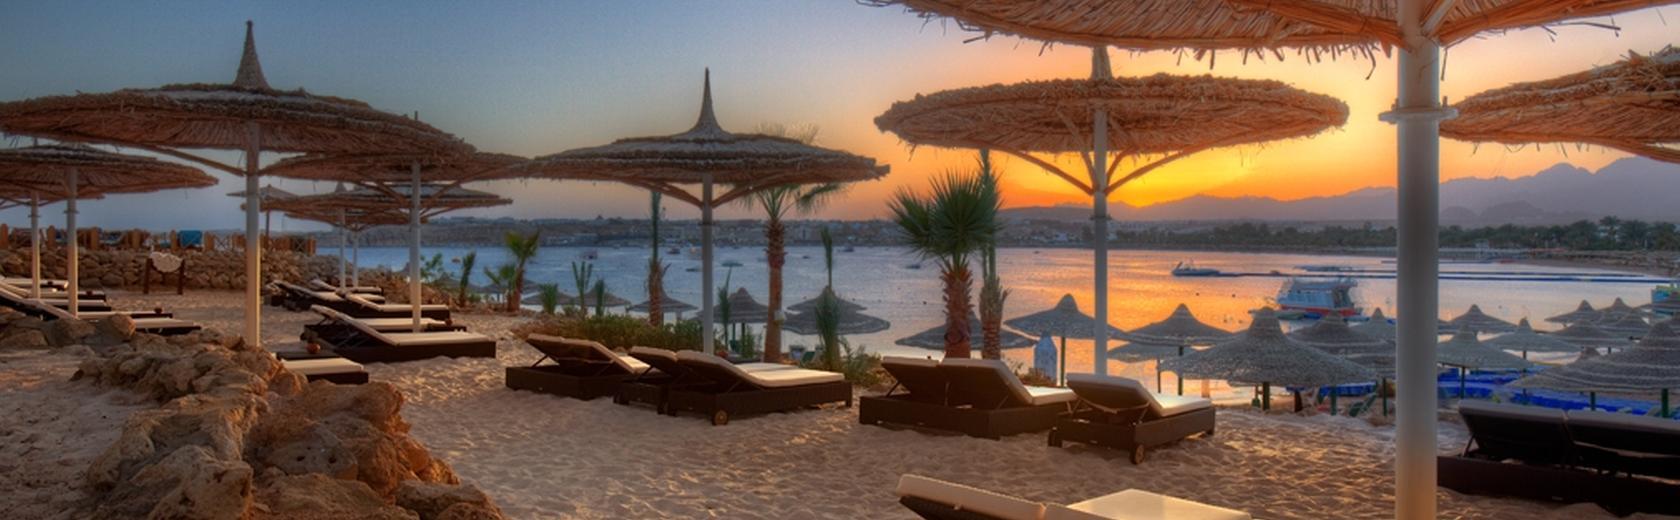 Le Royale Sonesta Collection Luxury Resort image1